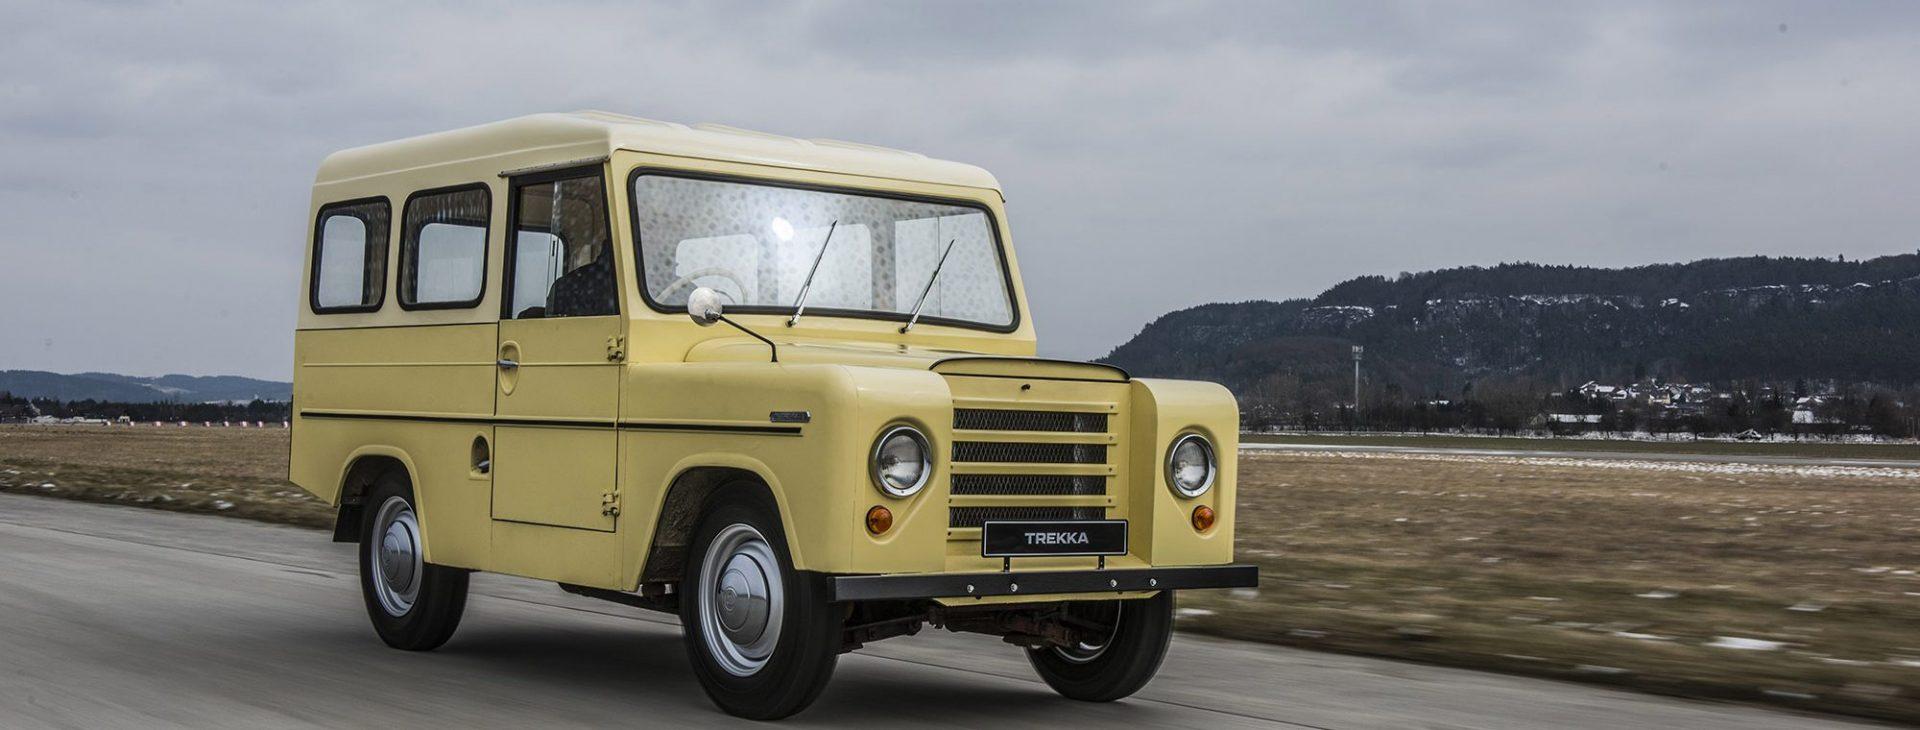 TREKKA: The Ancestor of ŠKODA SUVs Was New Zealand's First Car